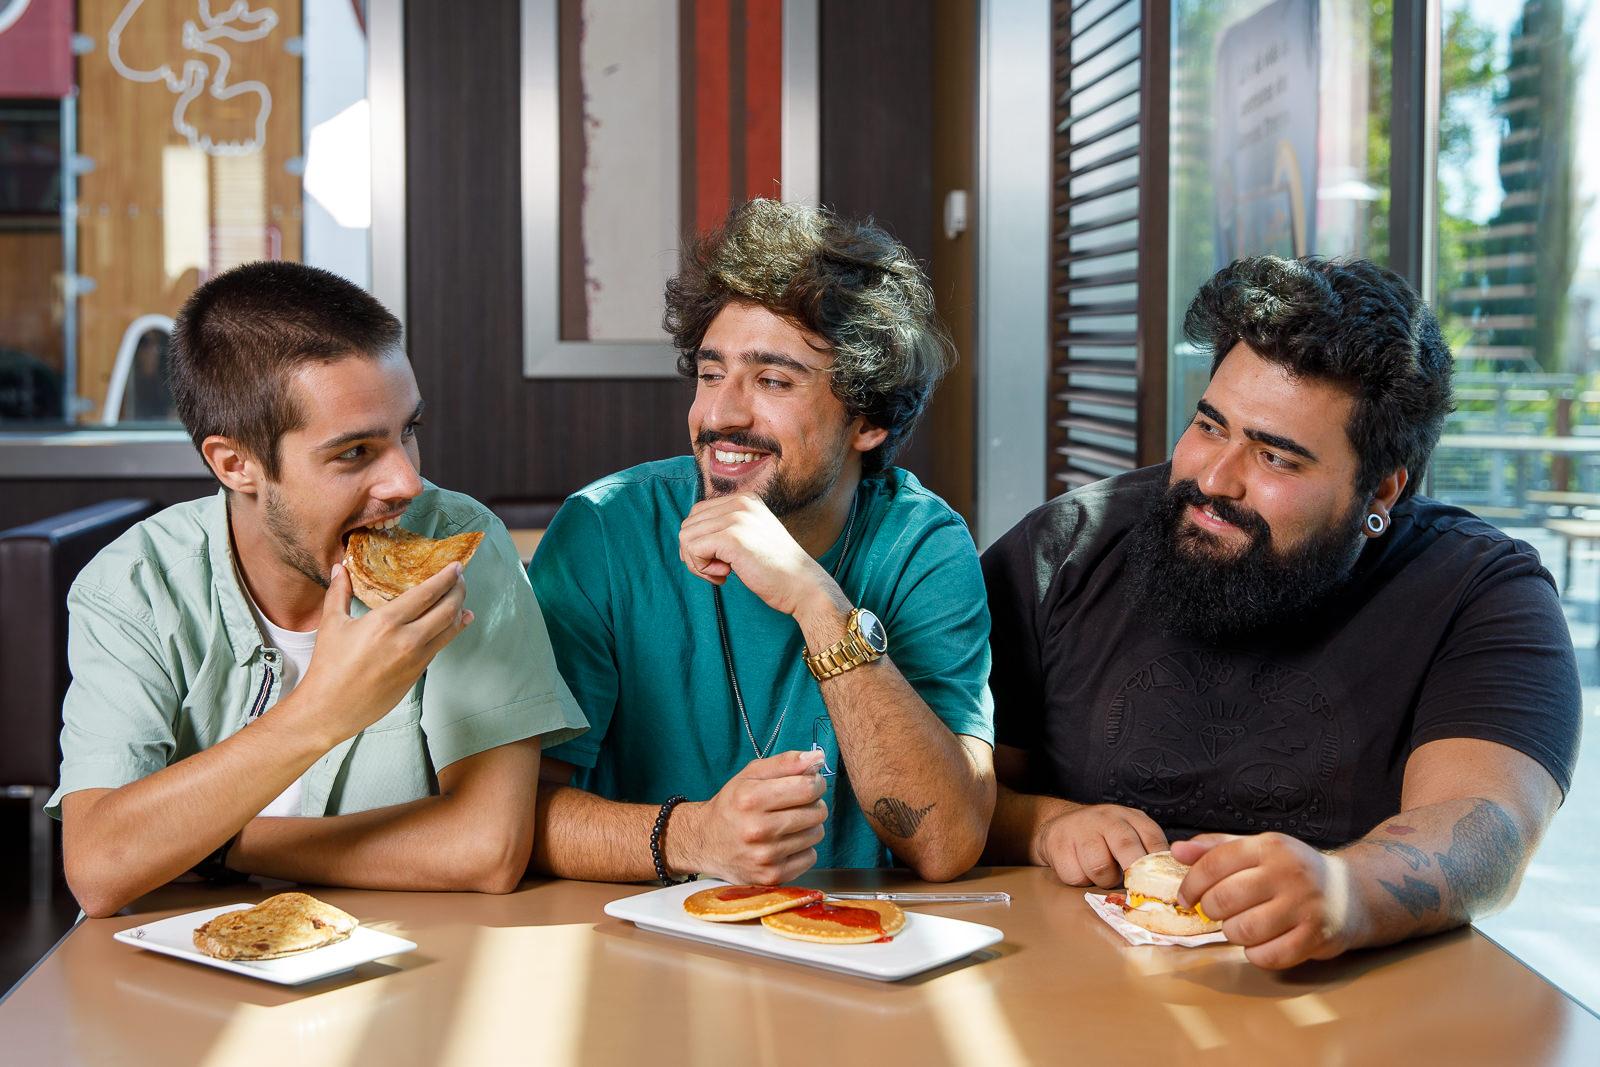 McDonalds_05.jpg